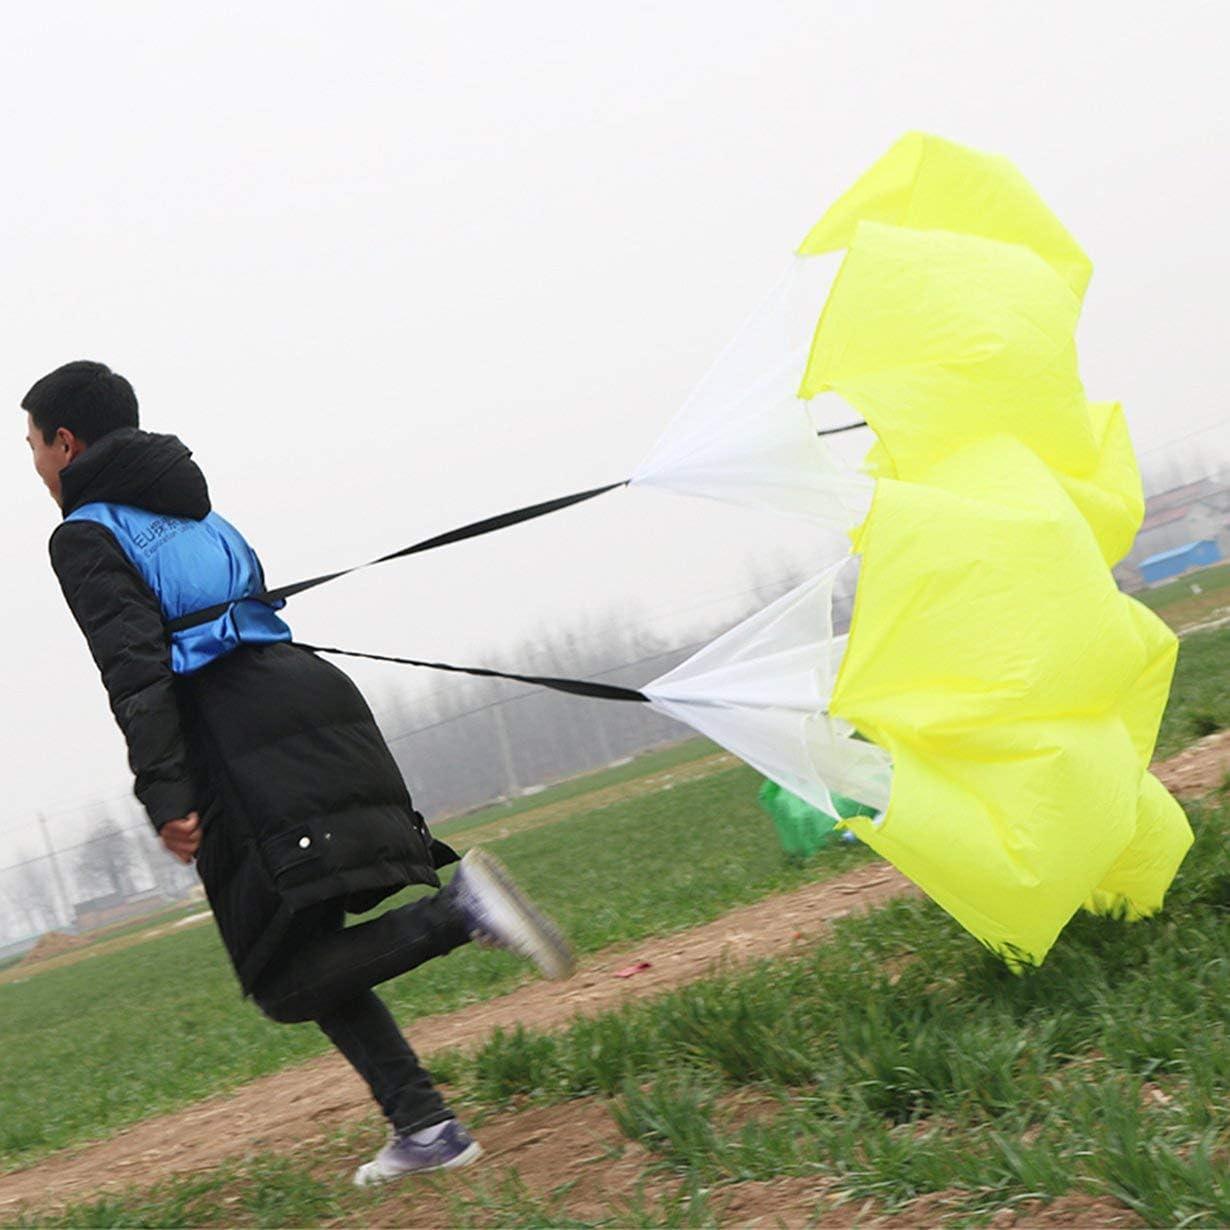 Camellia Vitesse R/ésistance Parachute Training Course Sport Chute Football Exercice Jaune